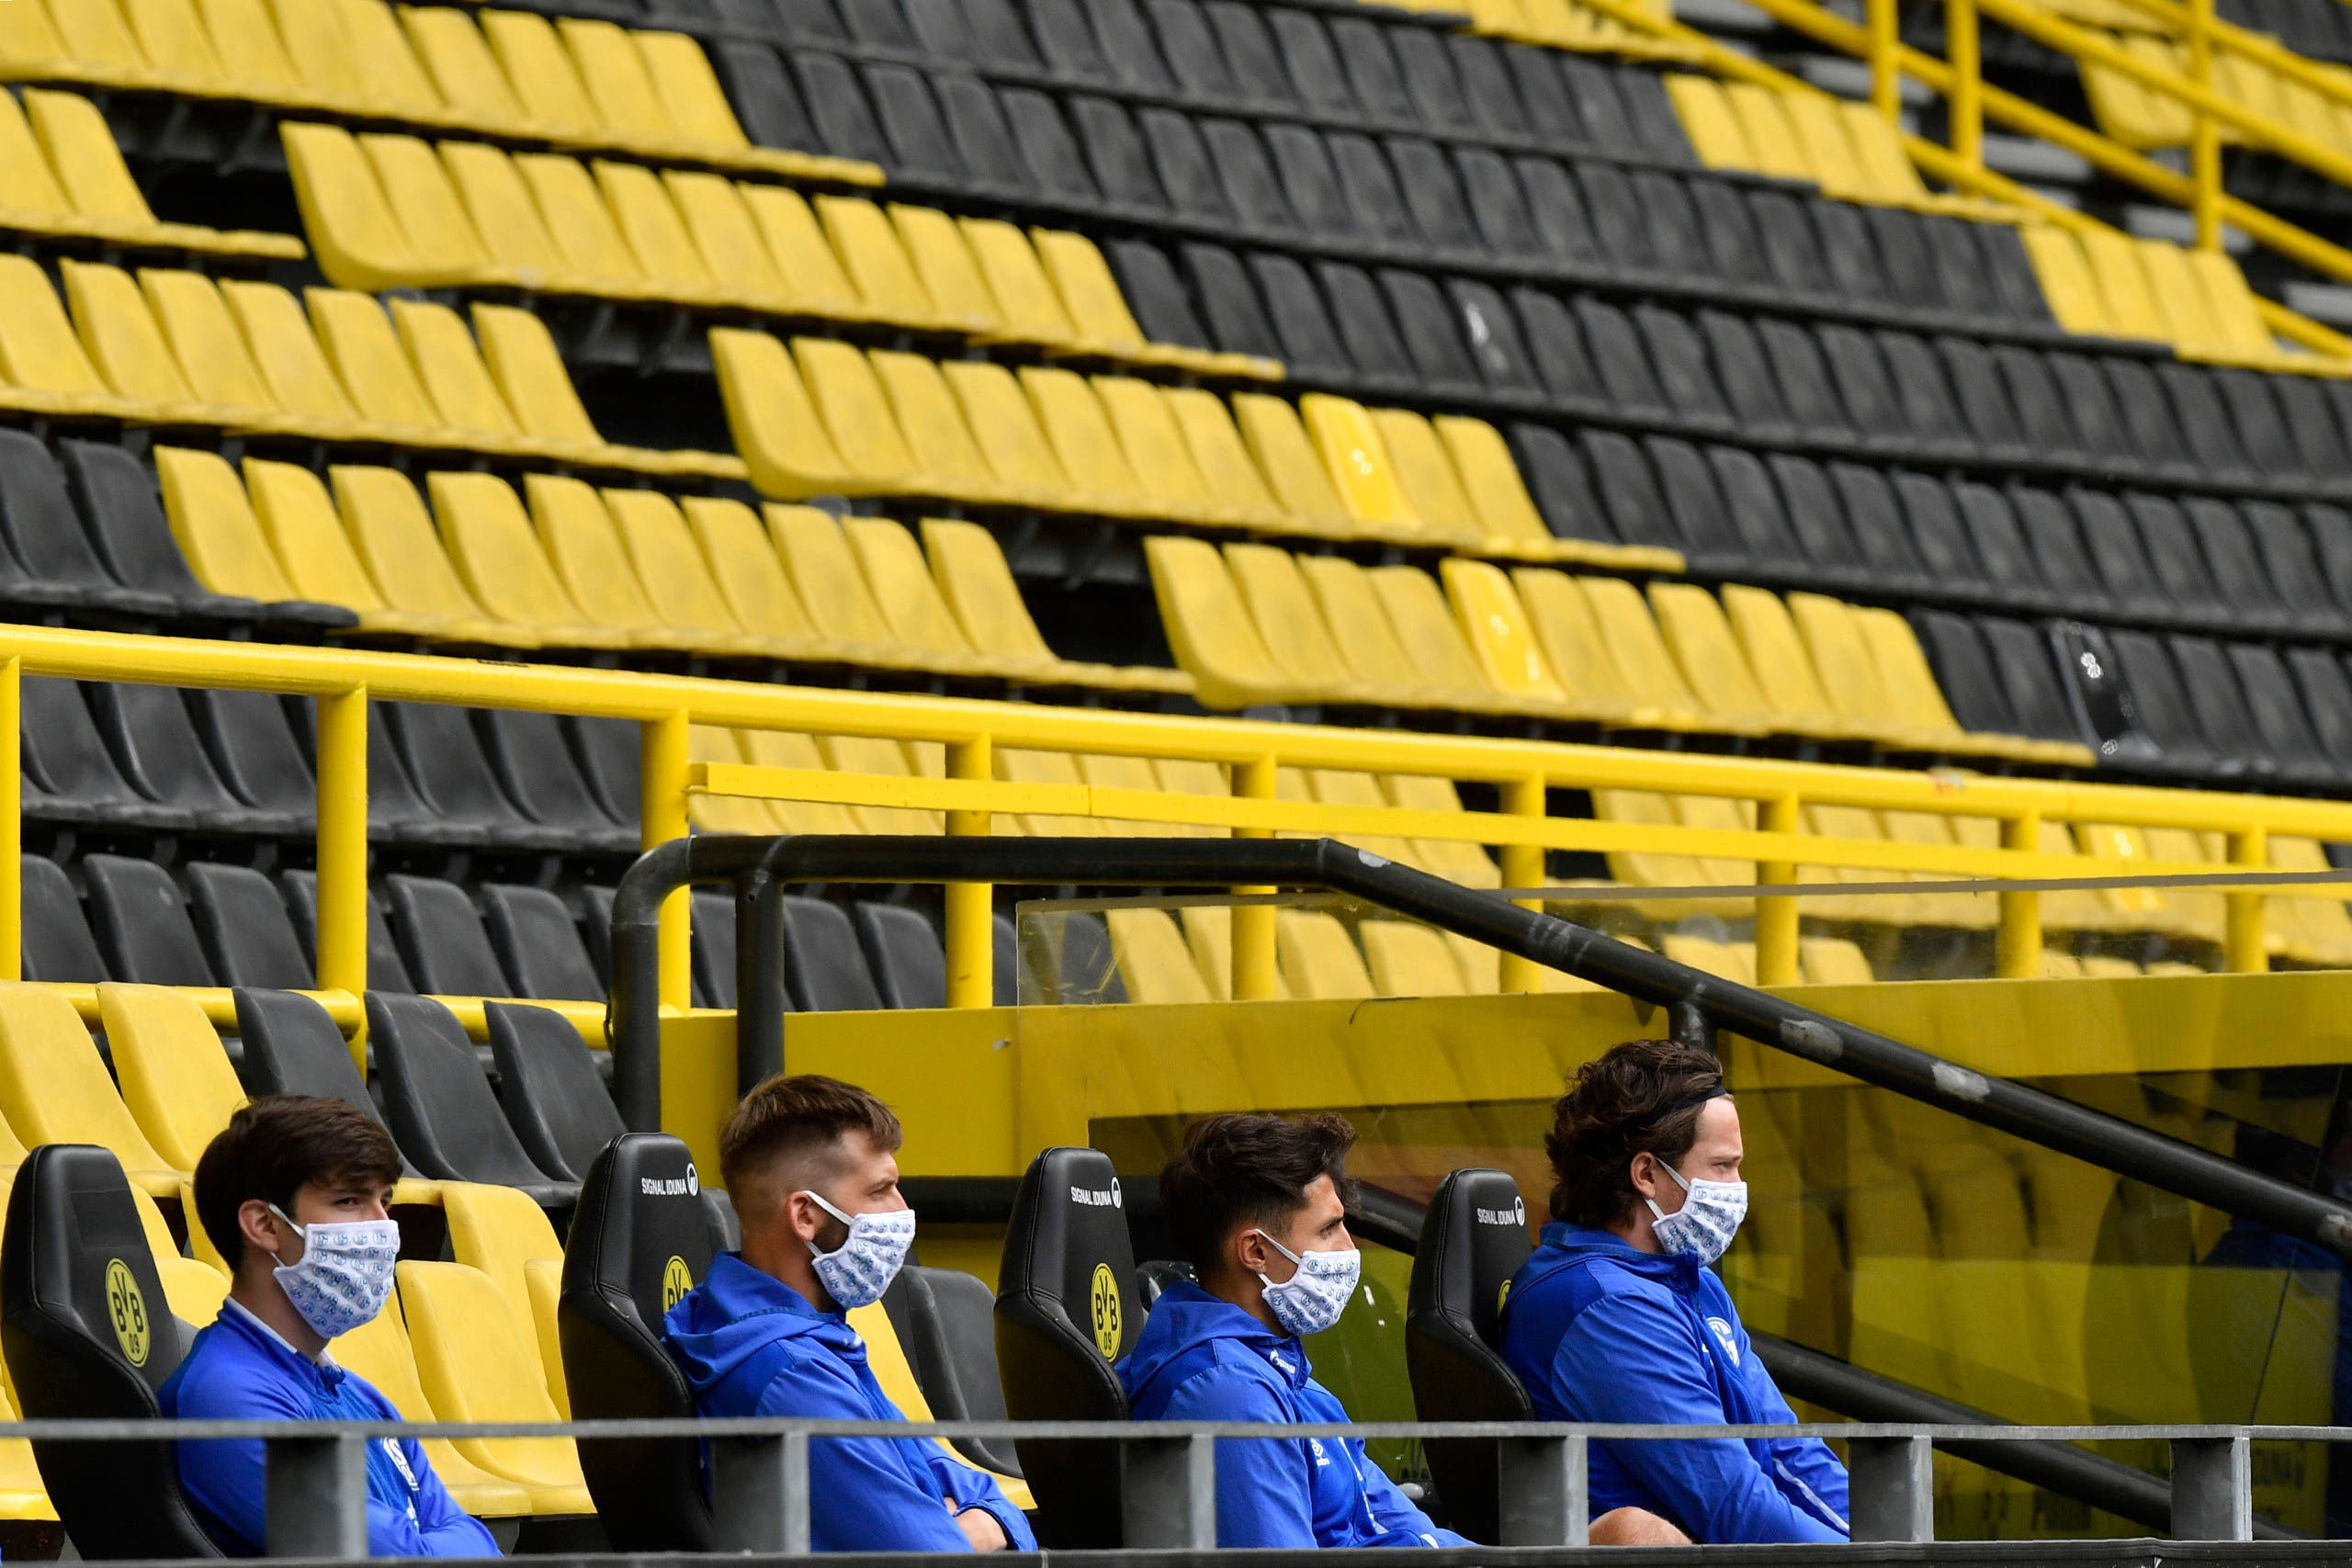 Schalke alternate players sit on the bench during the German Bundesliga football match between Borussia Dortmund and Schalke 04 in Dortmund, Germany, on Saturday, May 16, 2020. (AP)